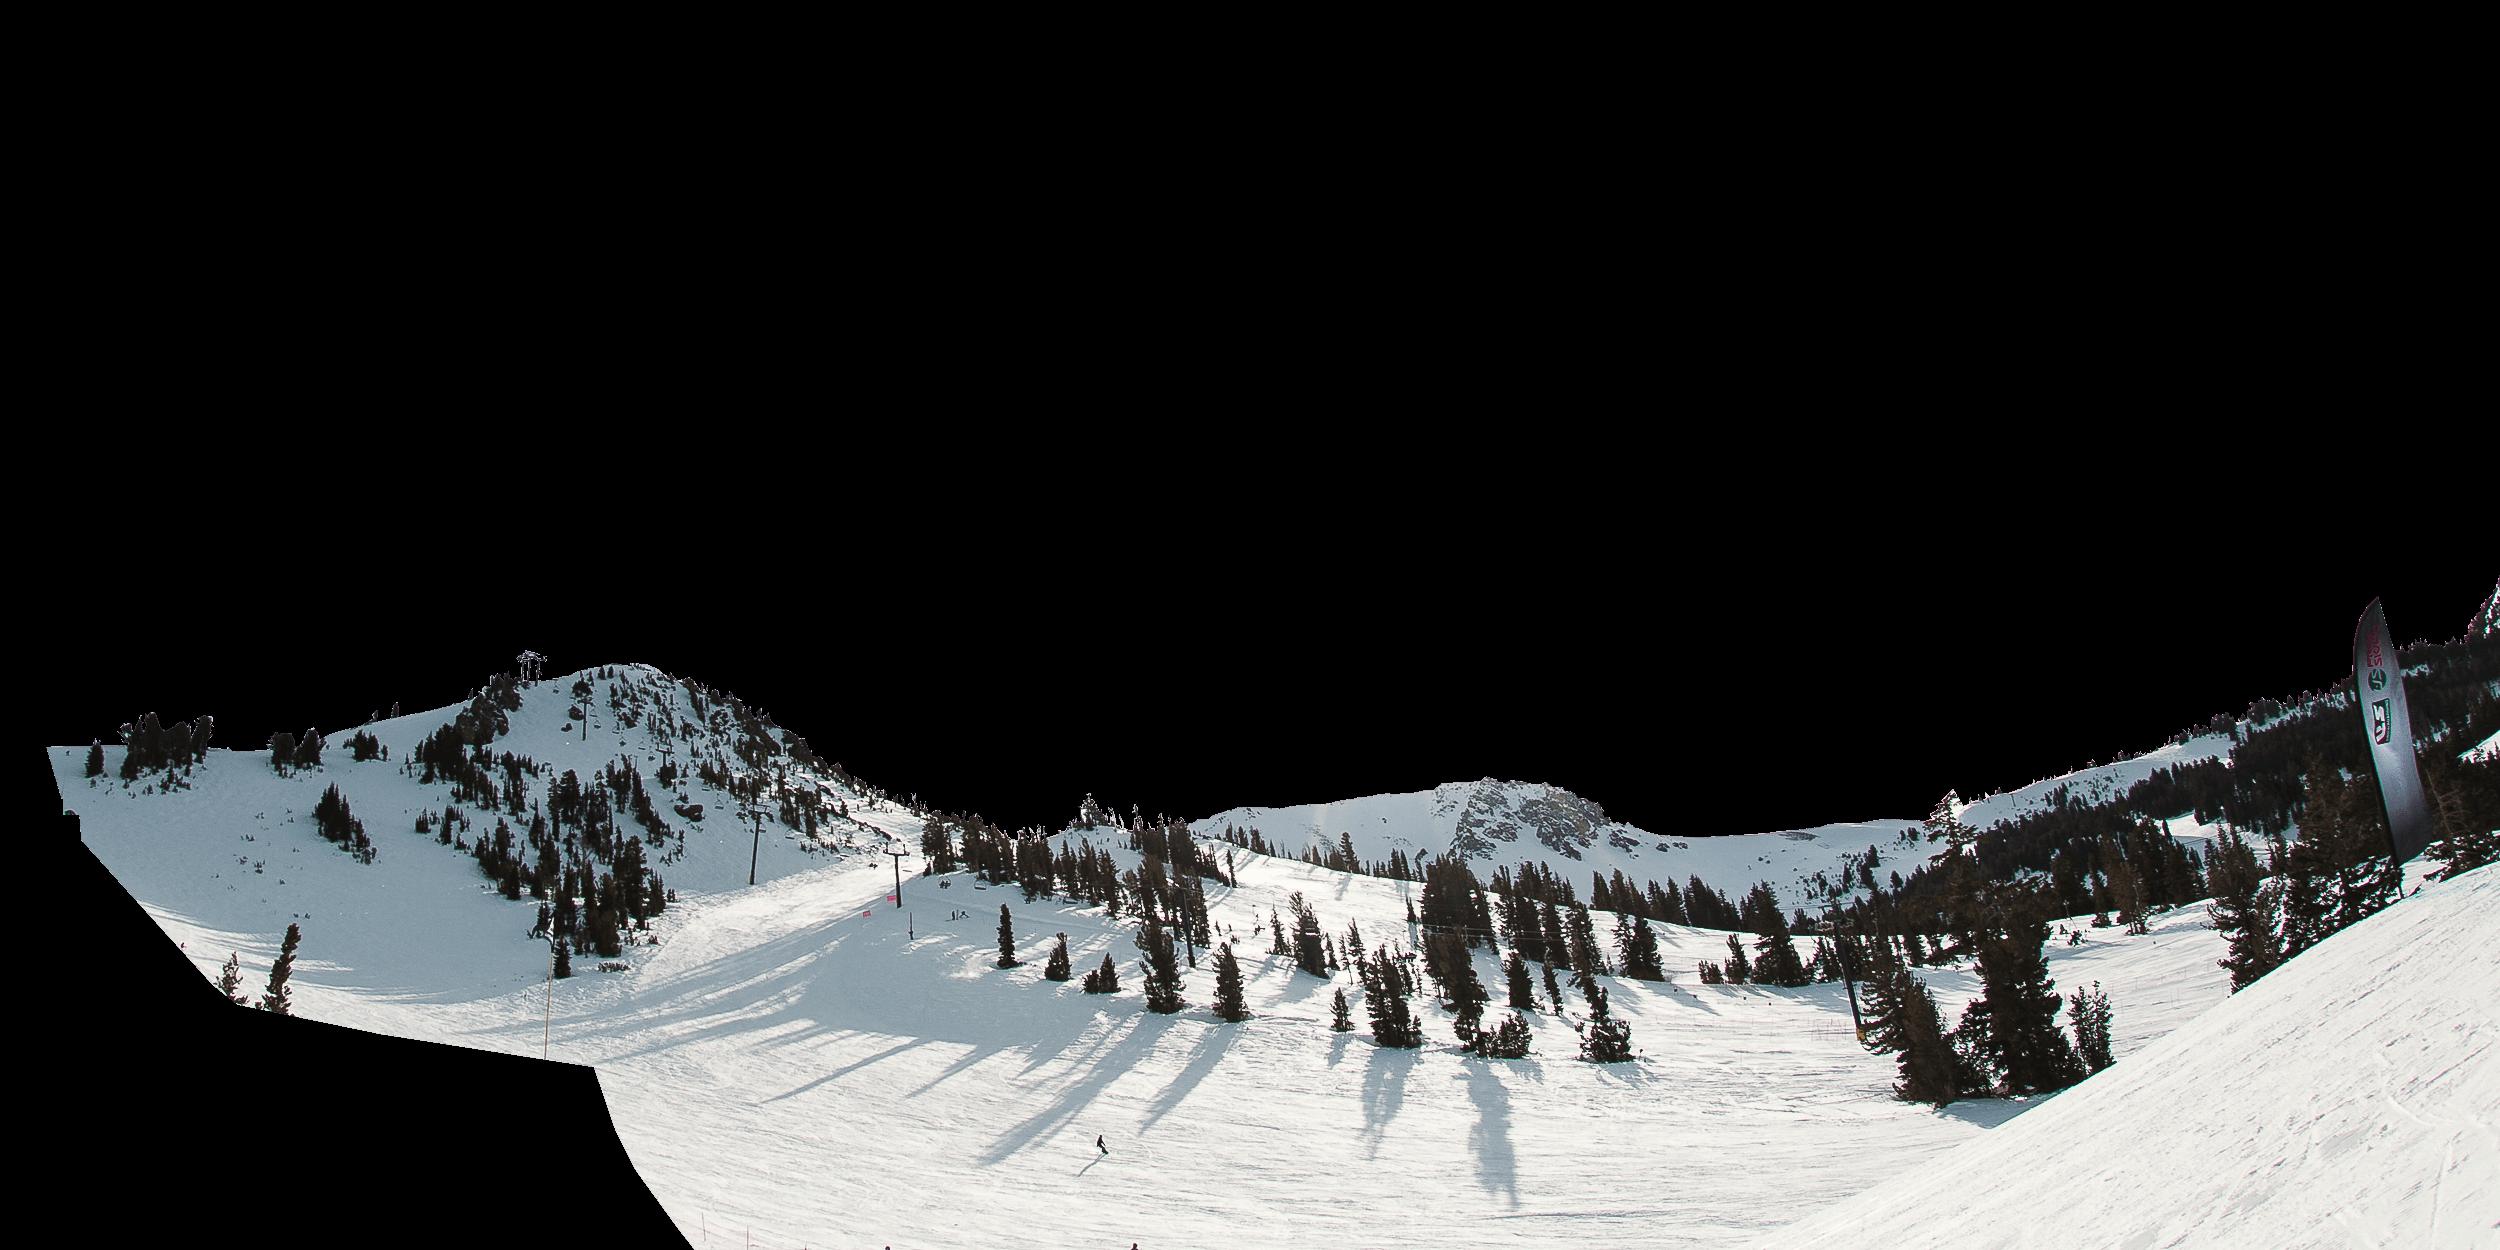 Home ryan stassel . Glacier clipart mountain skiing